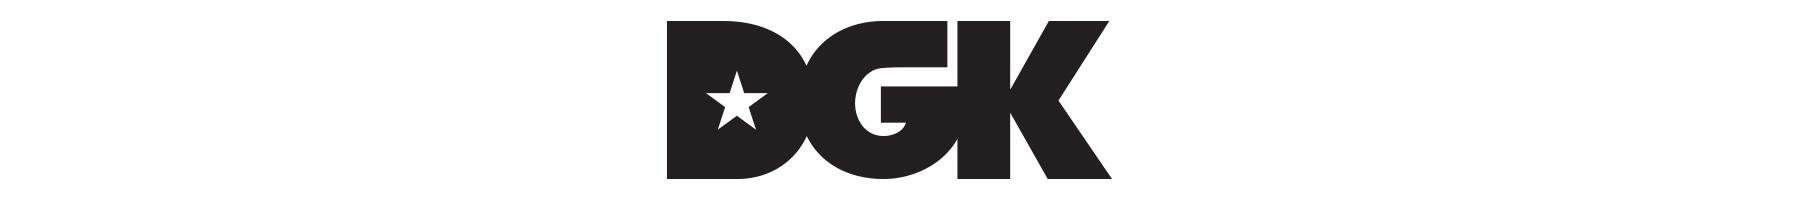 DrJays.com - DGK